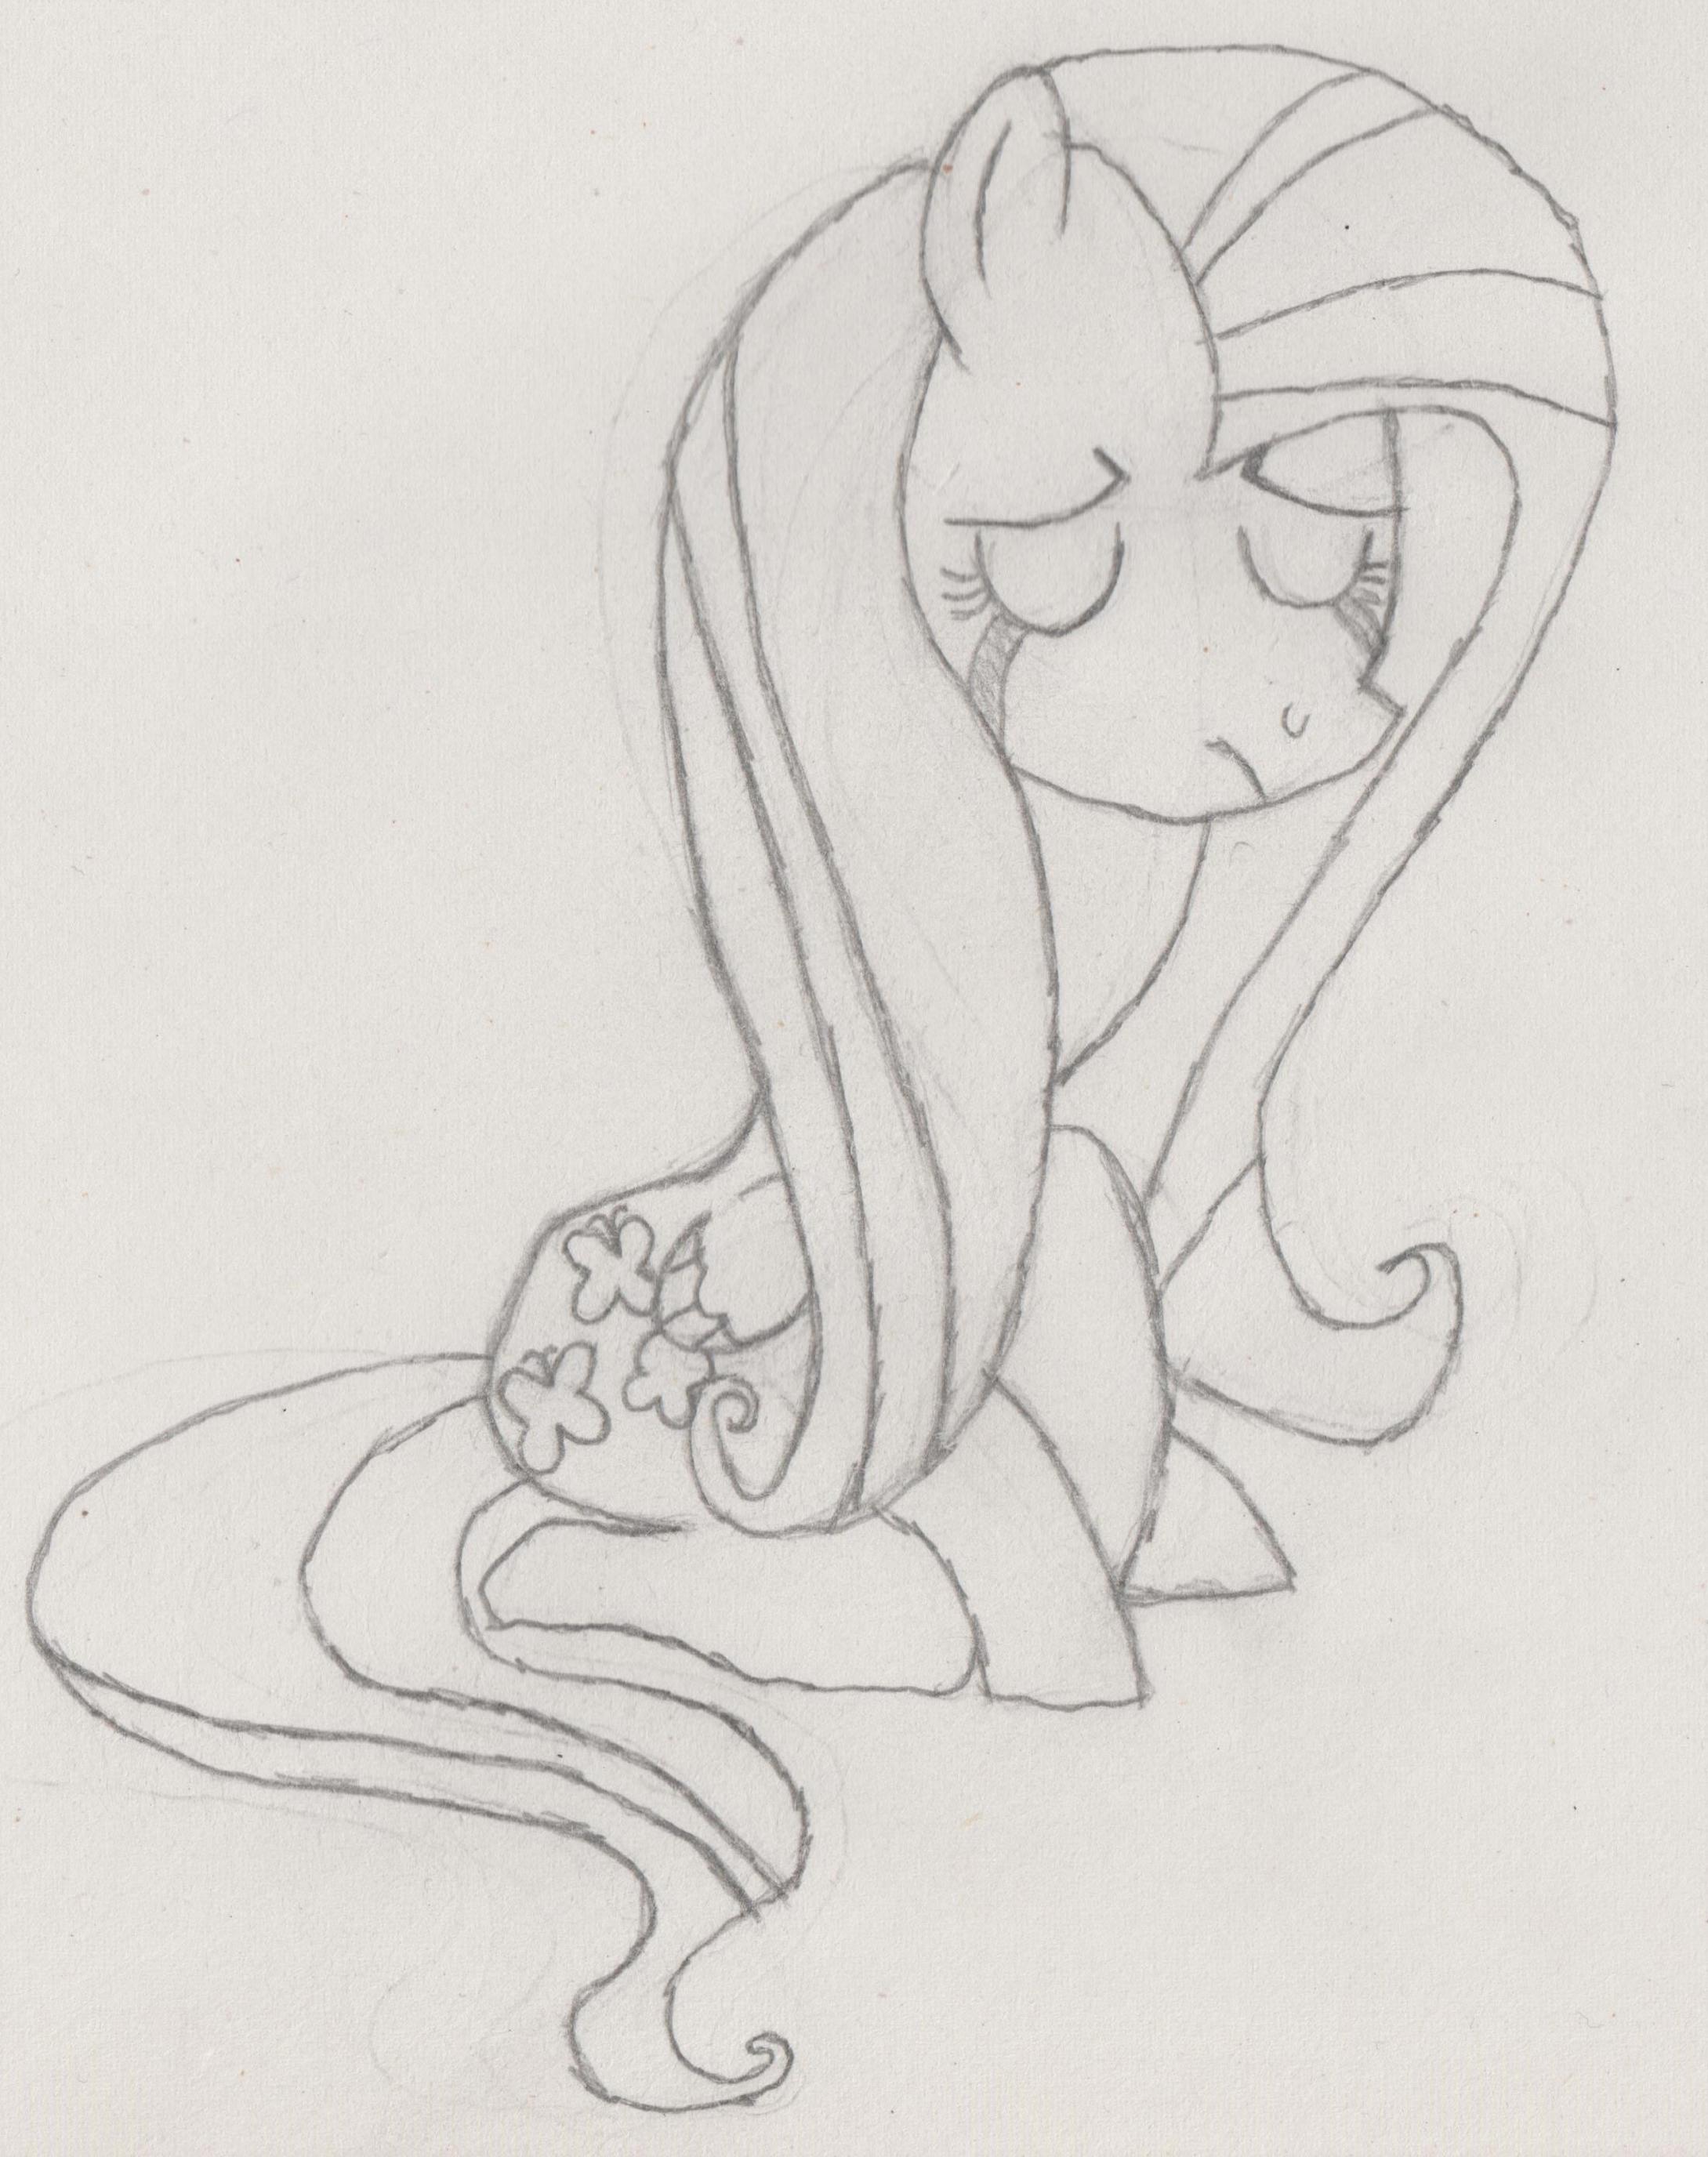 Flutter sad by HeadlongEquestria